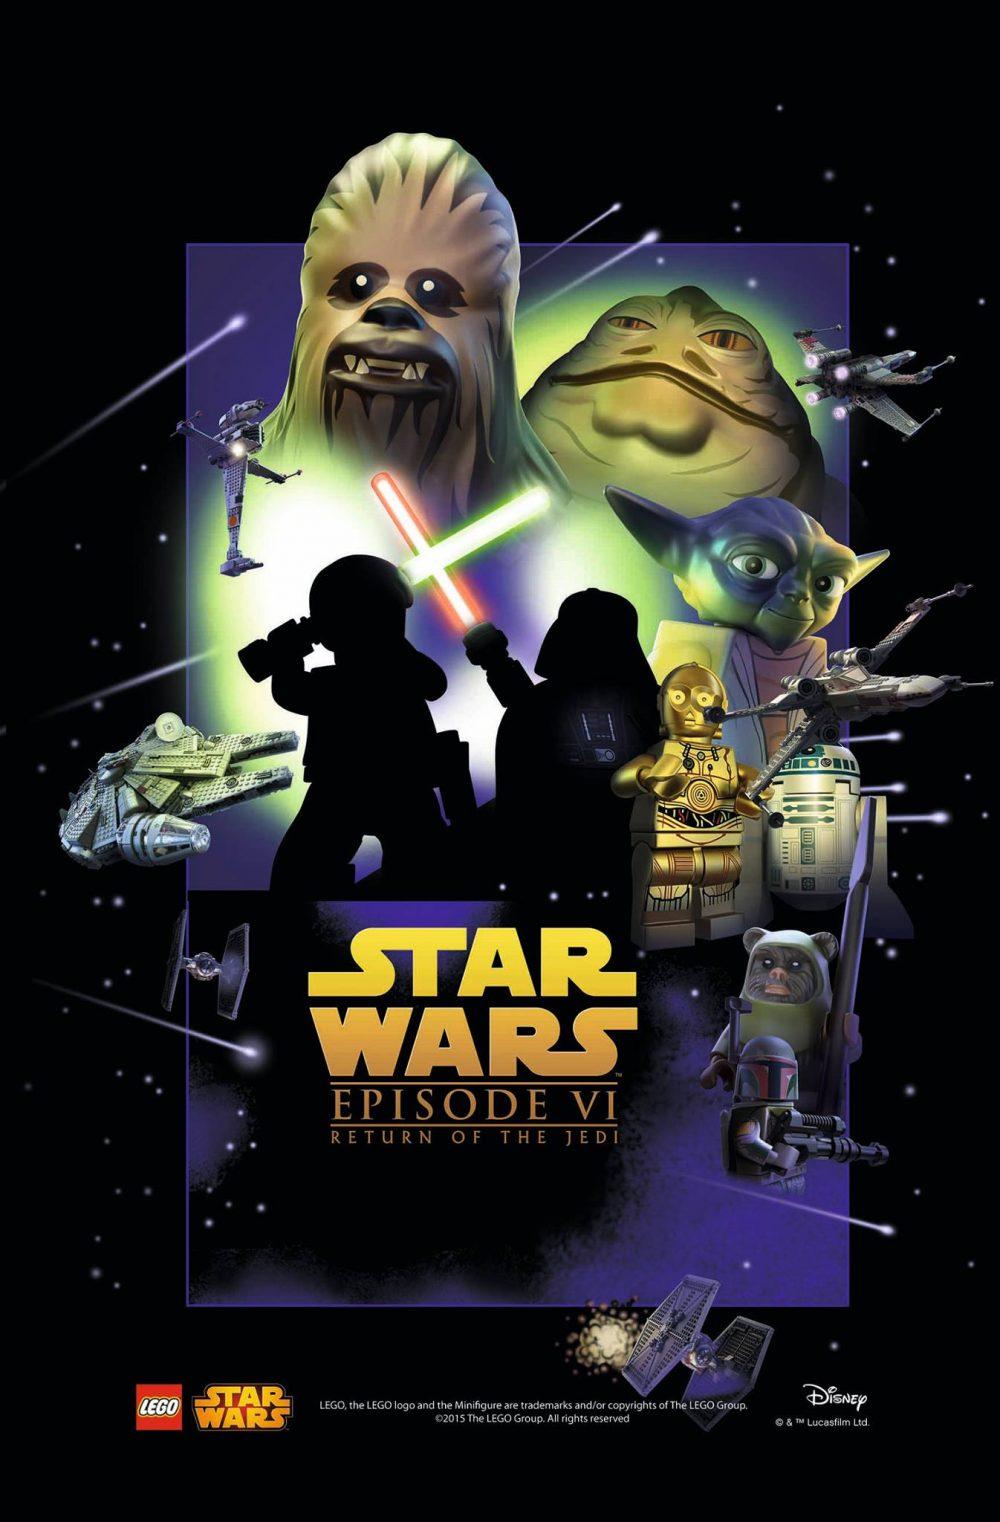 star wars poster lego episodio 6